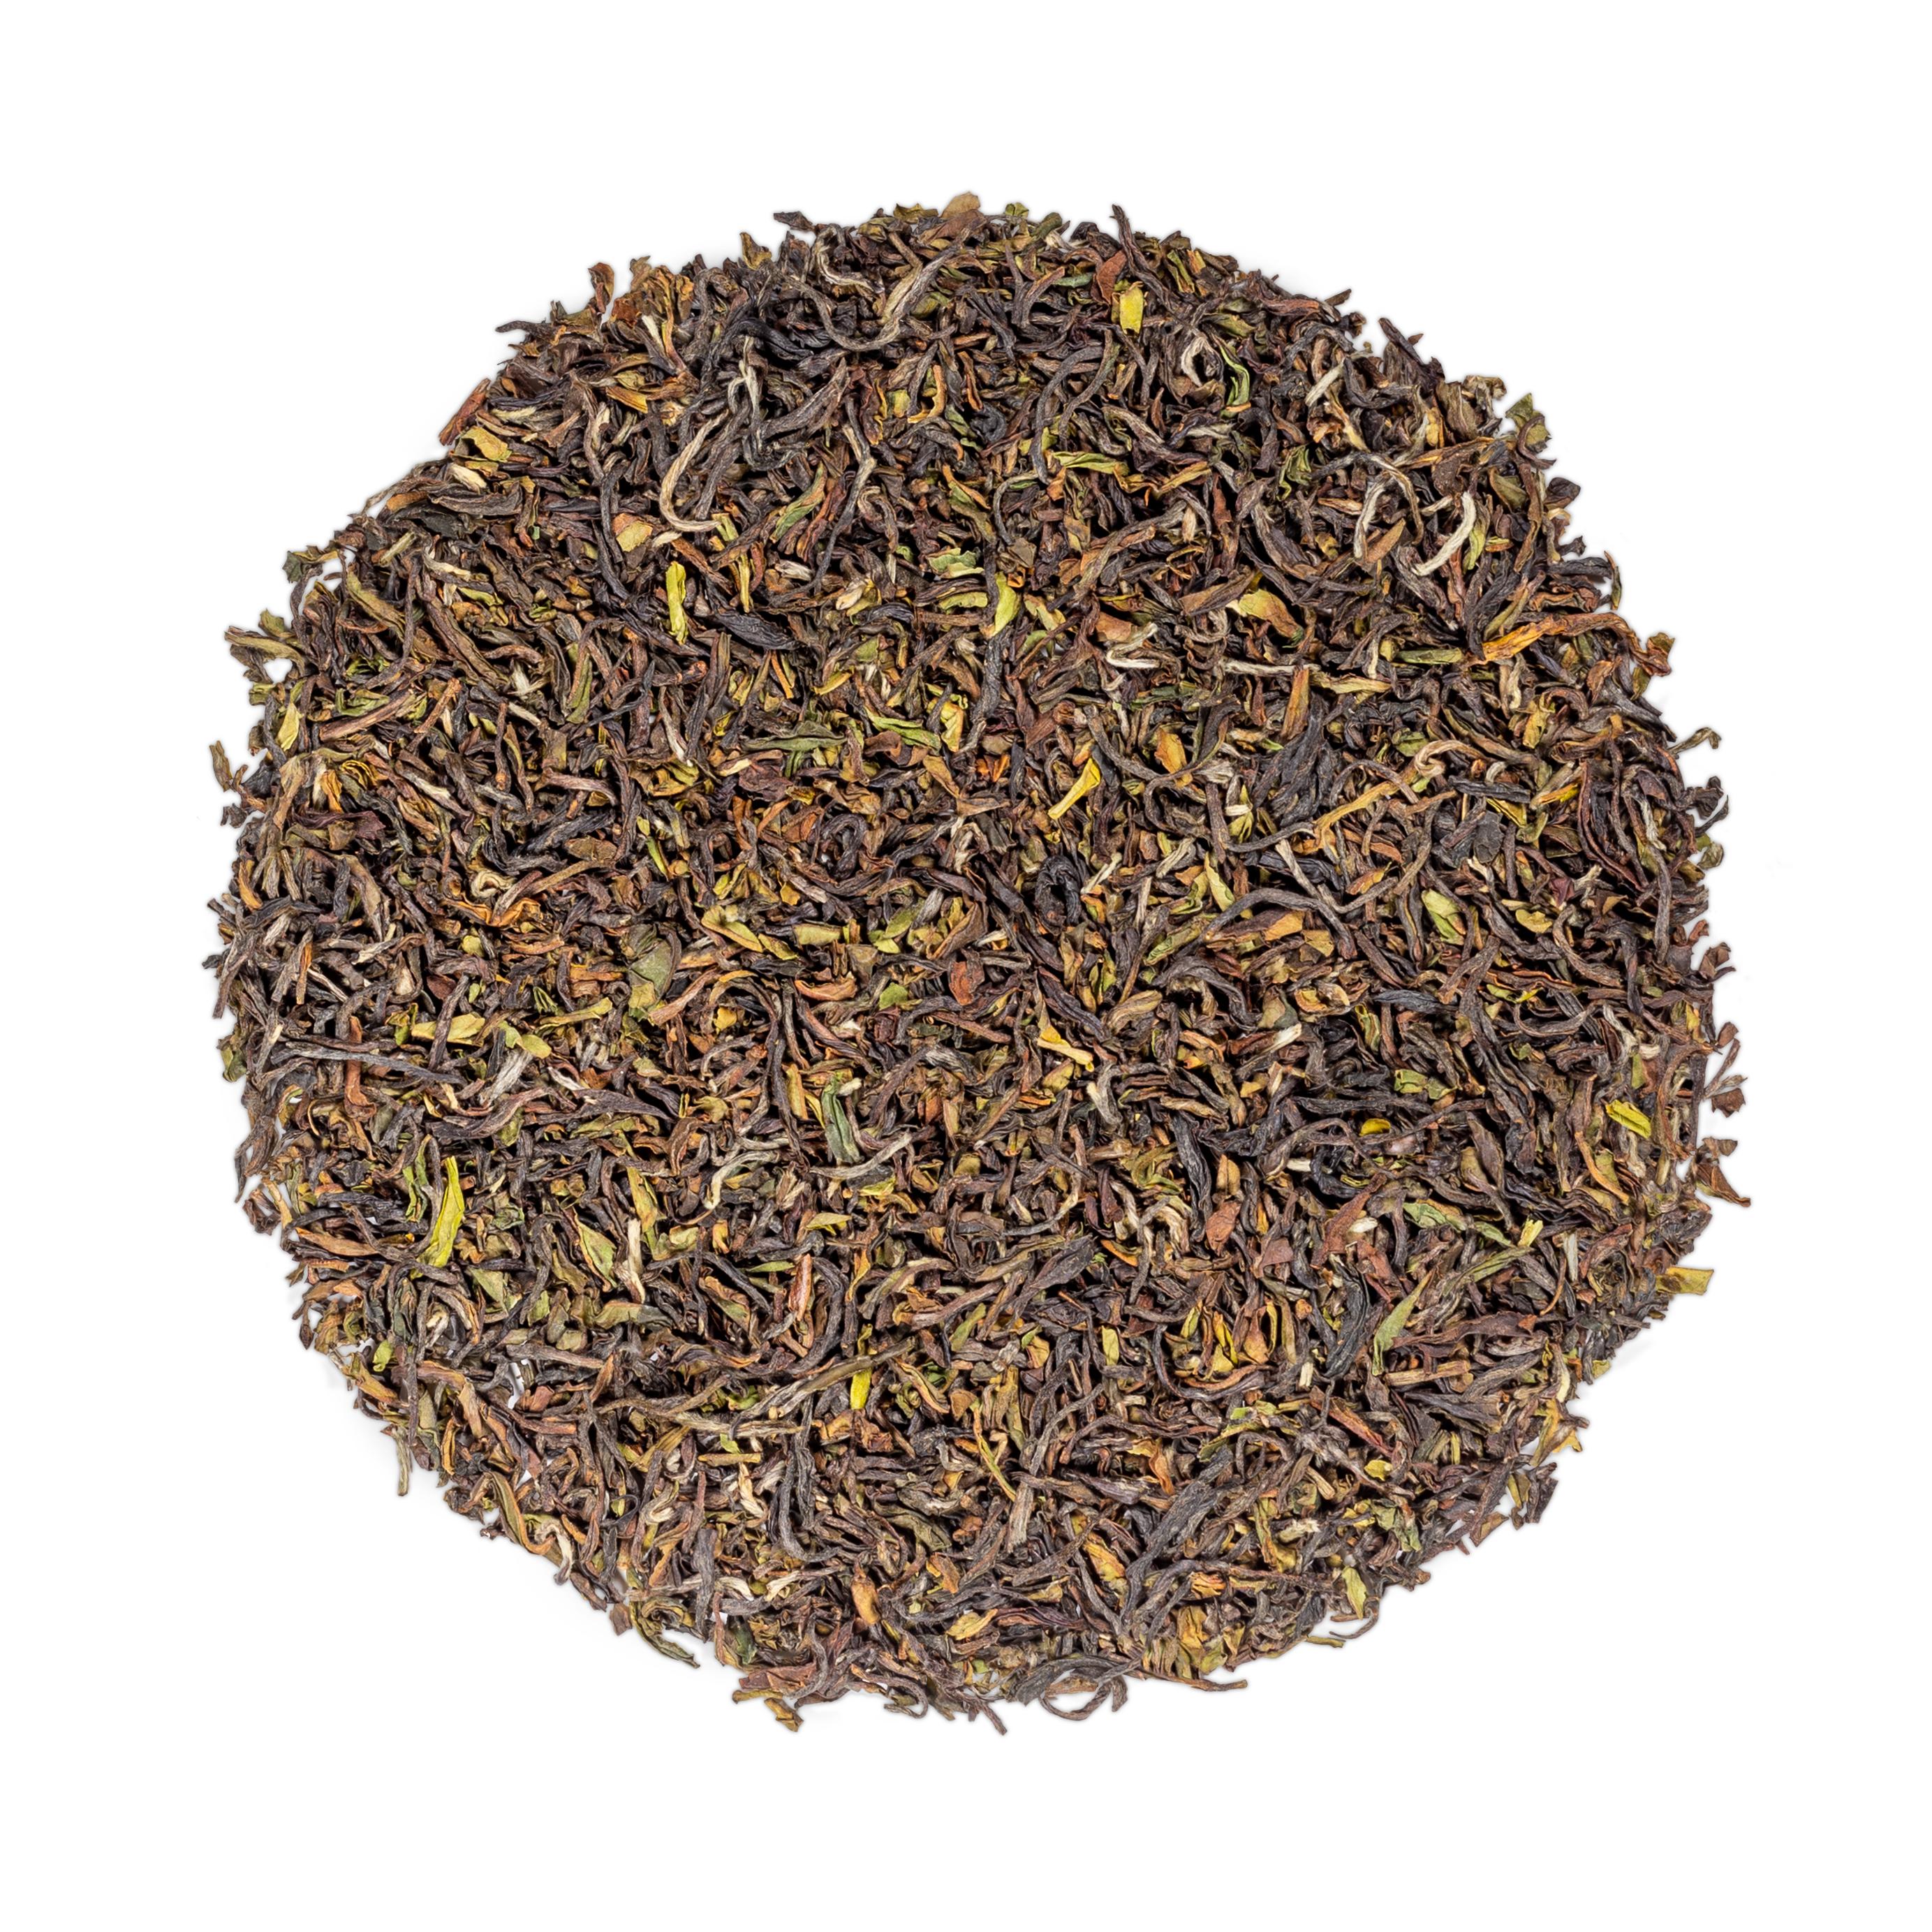 KUSMI TEA Thé noir du Népal, Jardin de Guranse bio  Thé noir  Kusmi Tea